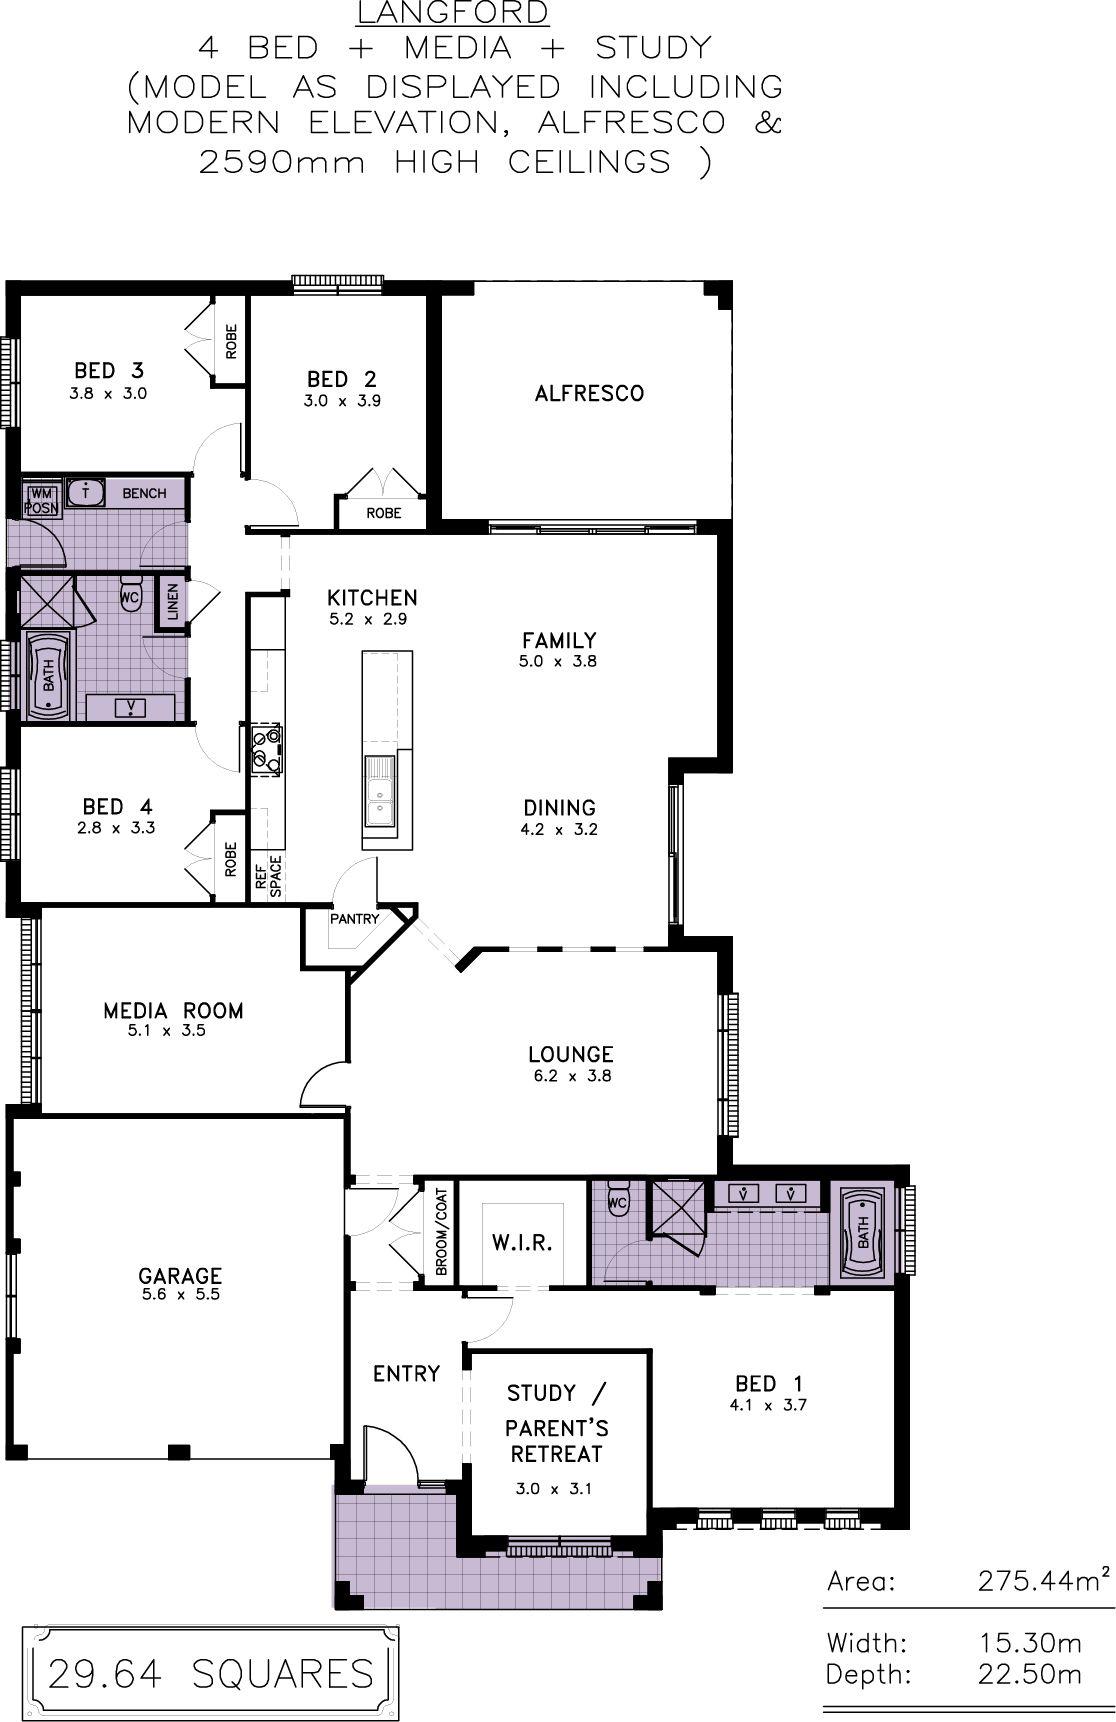 Langford Allworth Homes Granny Flat Resort Style Media Room